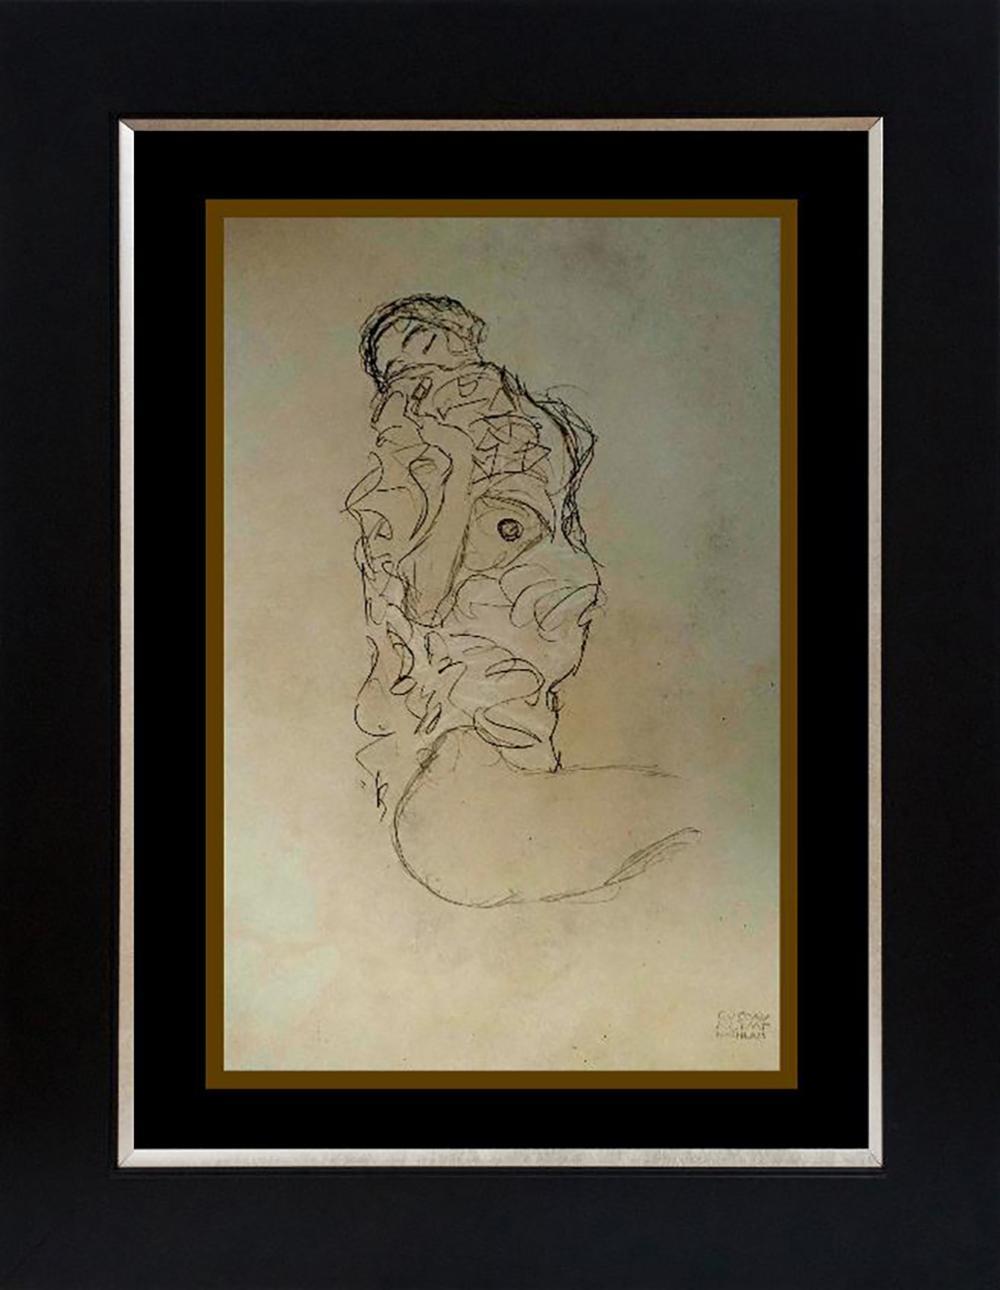 Gustav Klimt lithograph from 1967